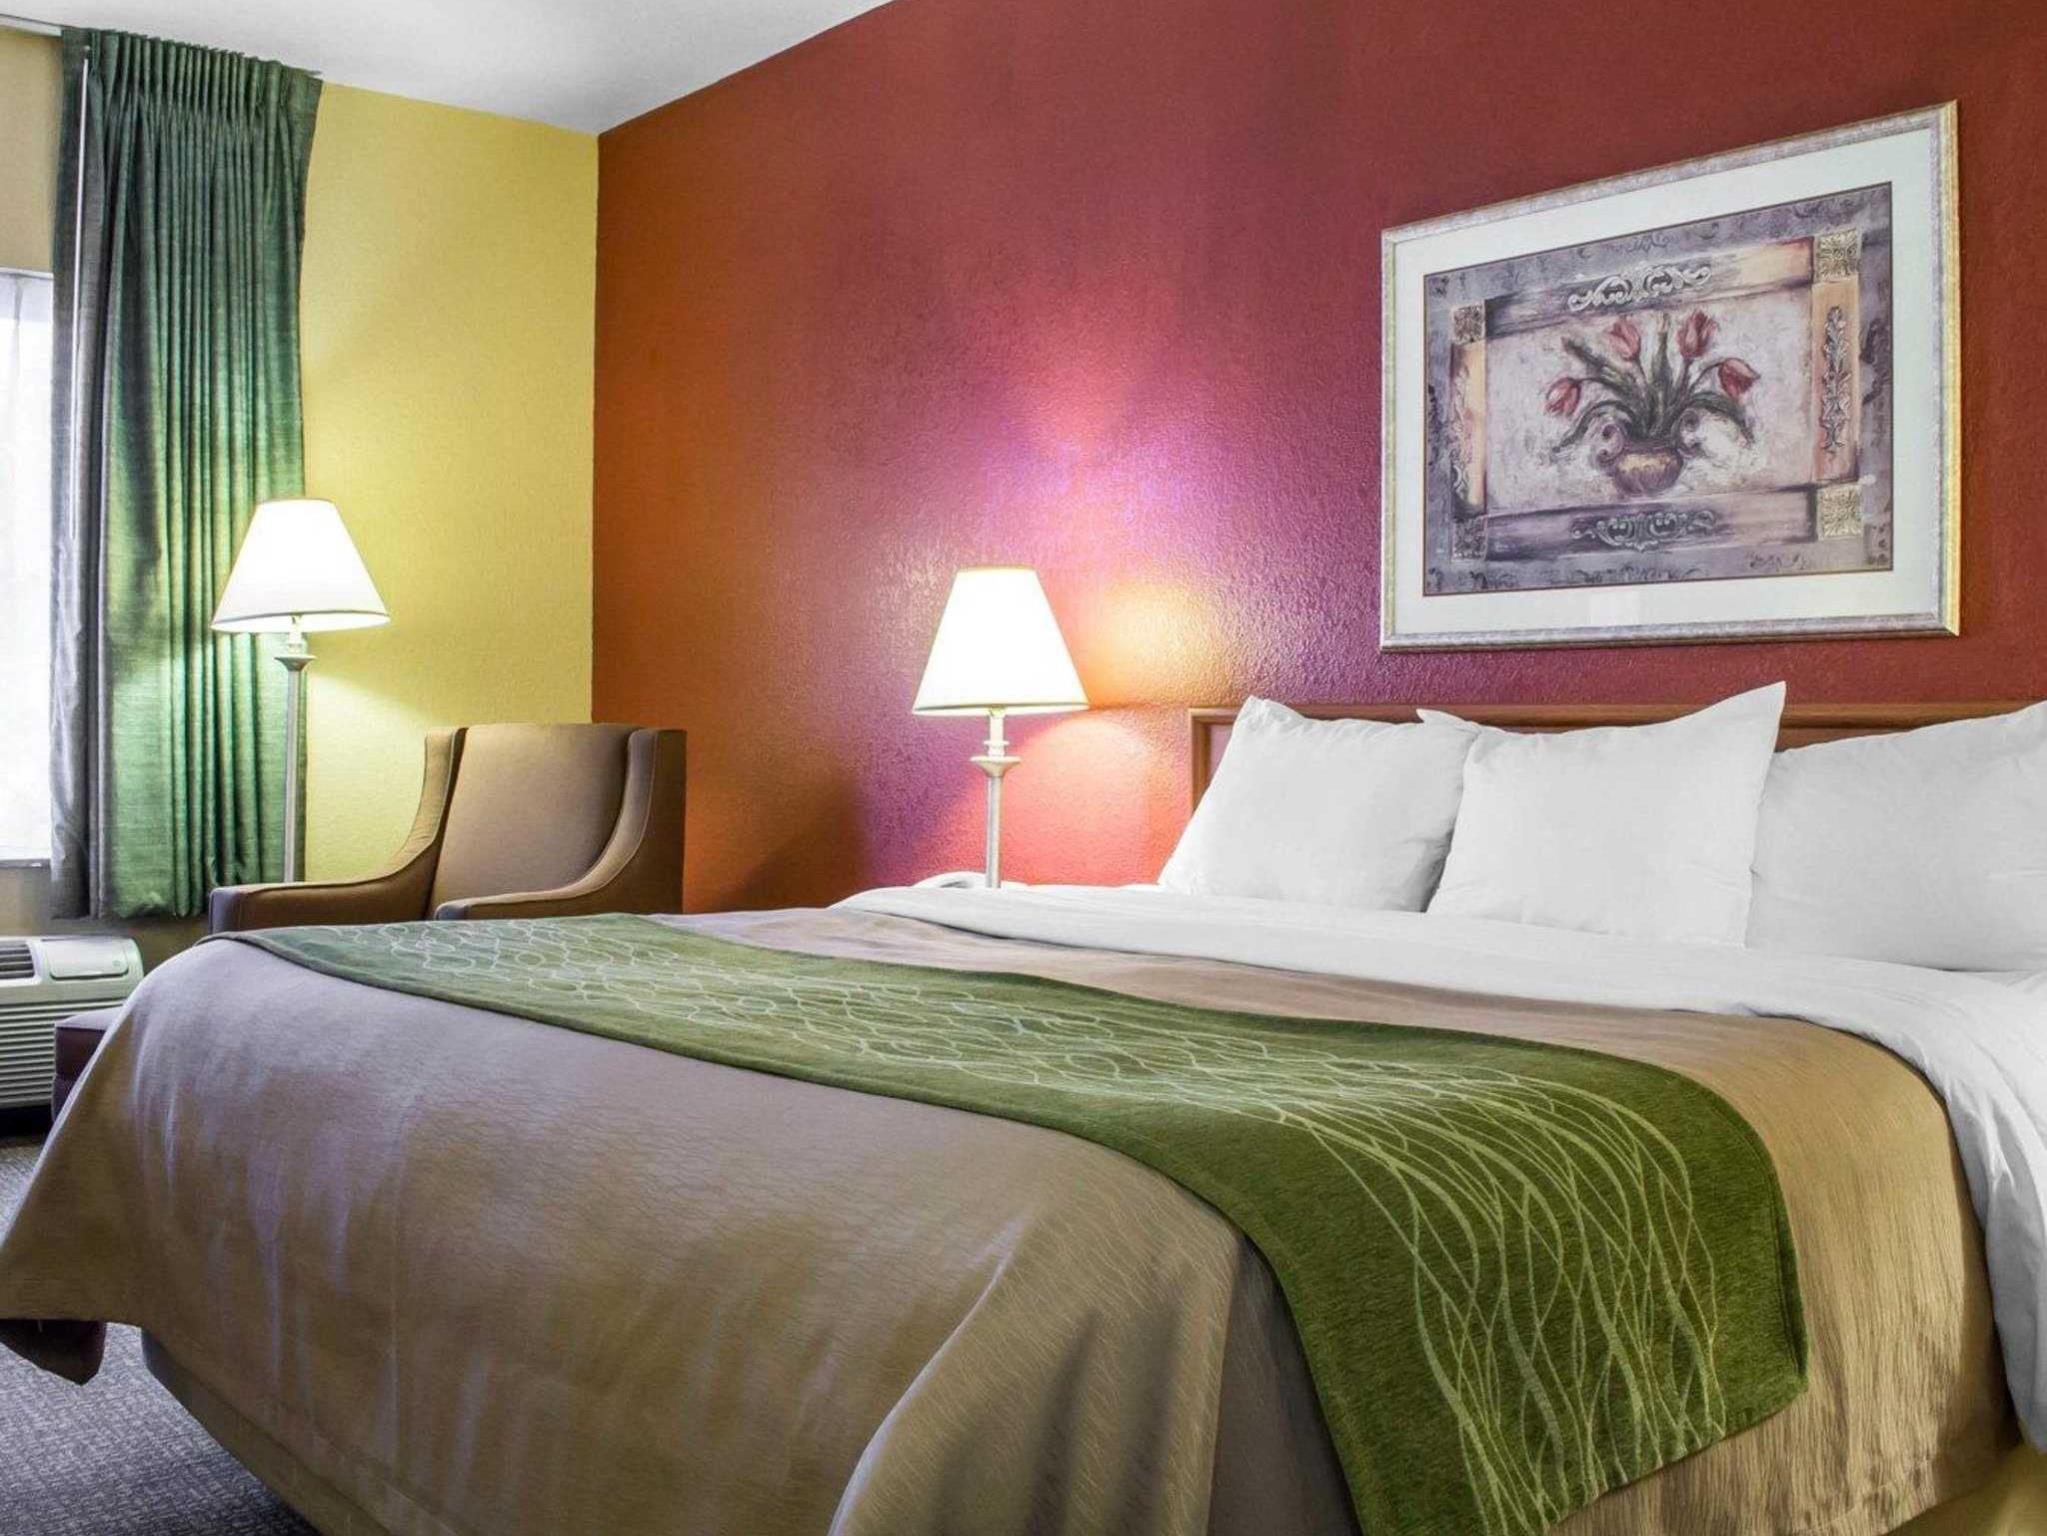 green comforter uga inn comfort view healthclub valley turismo hotels comfortinn az